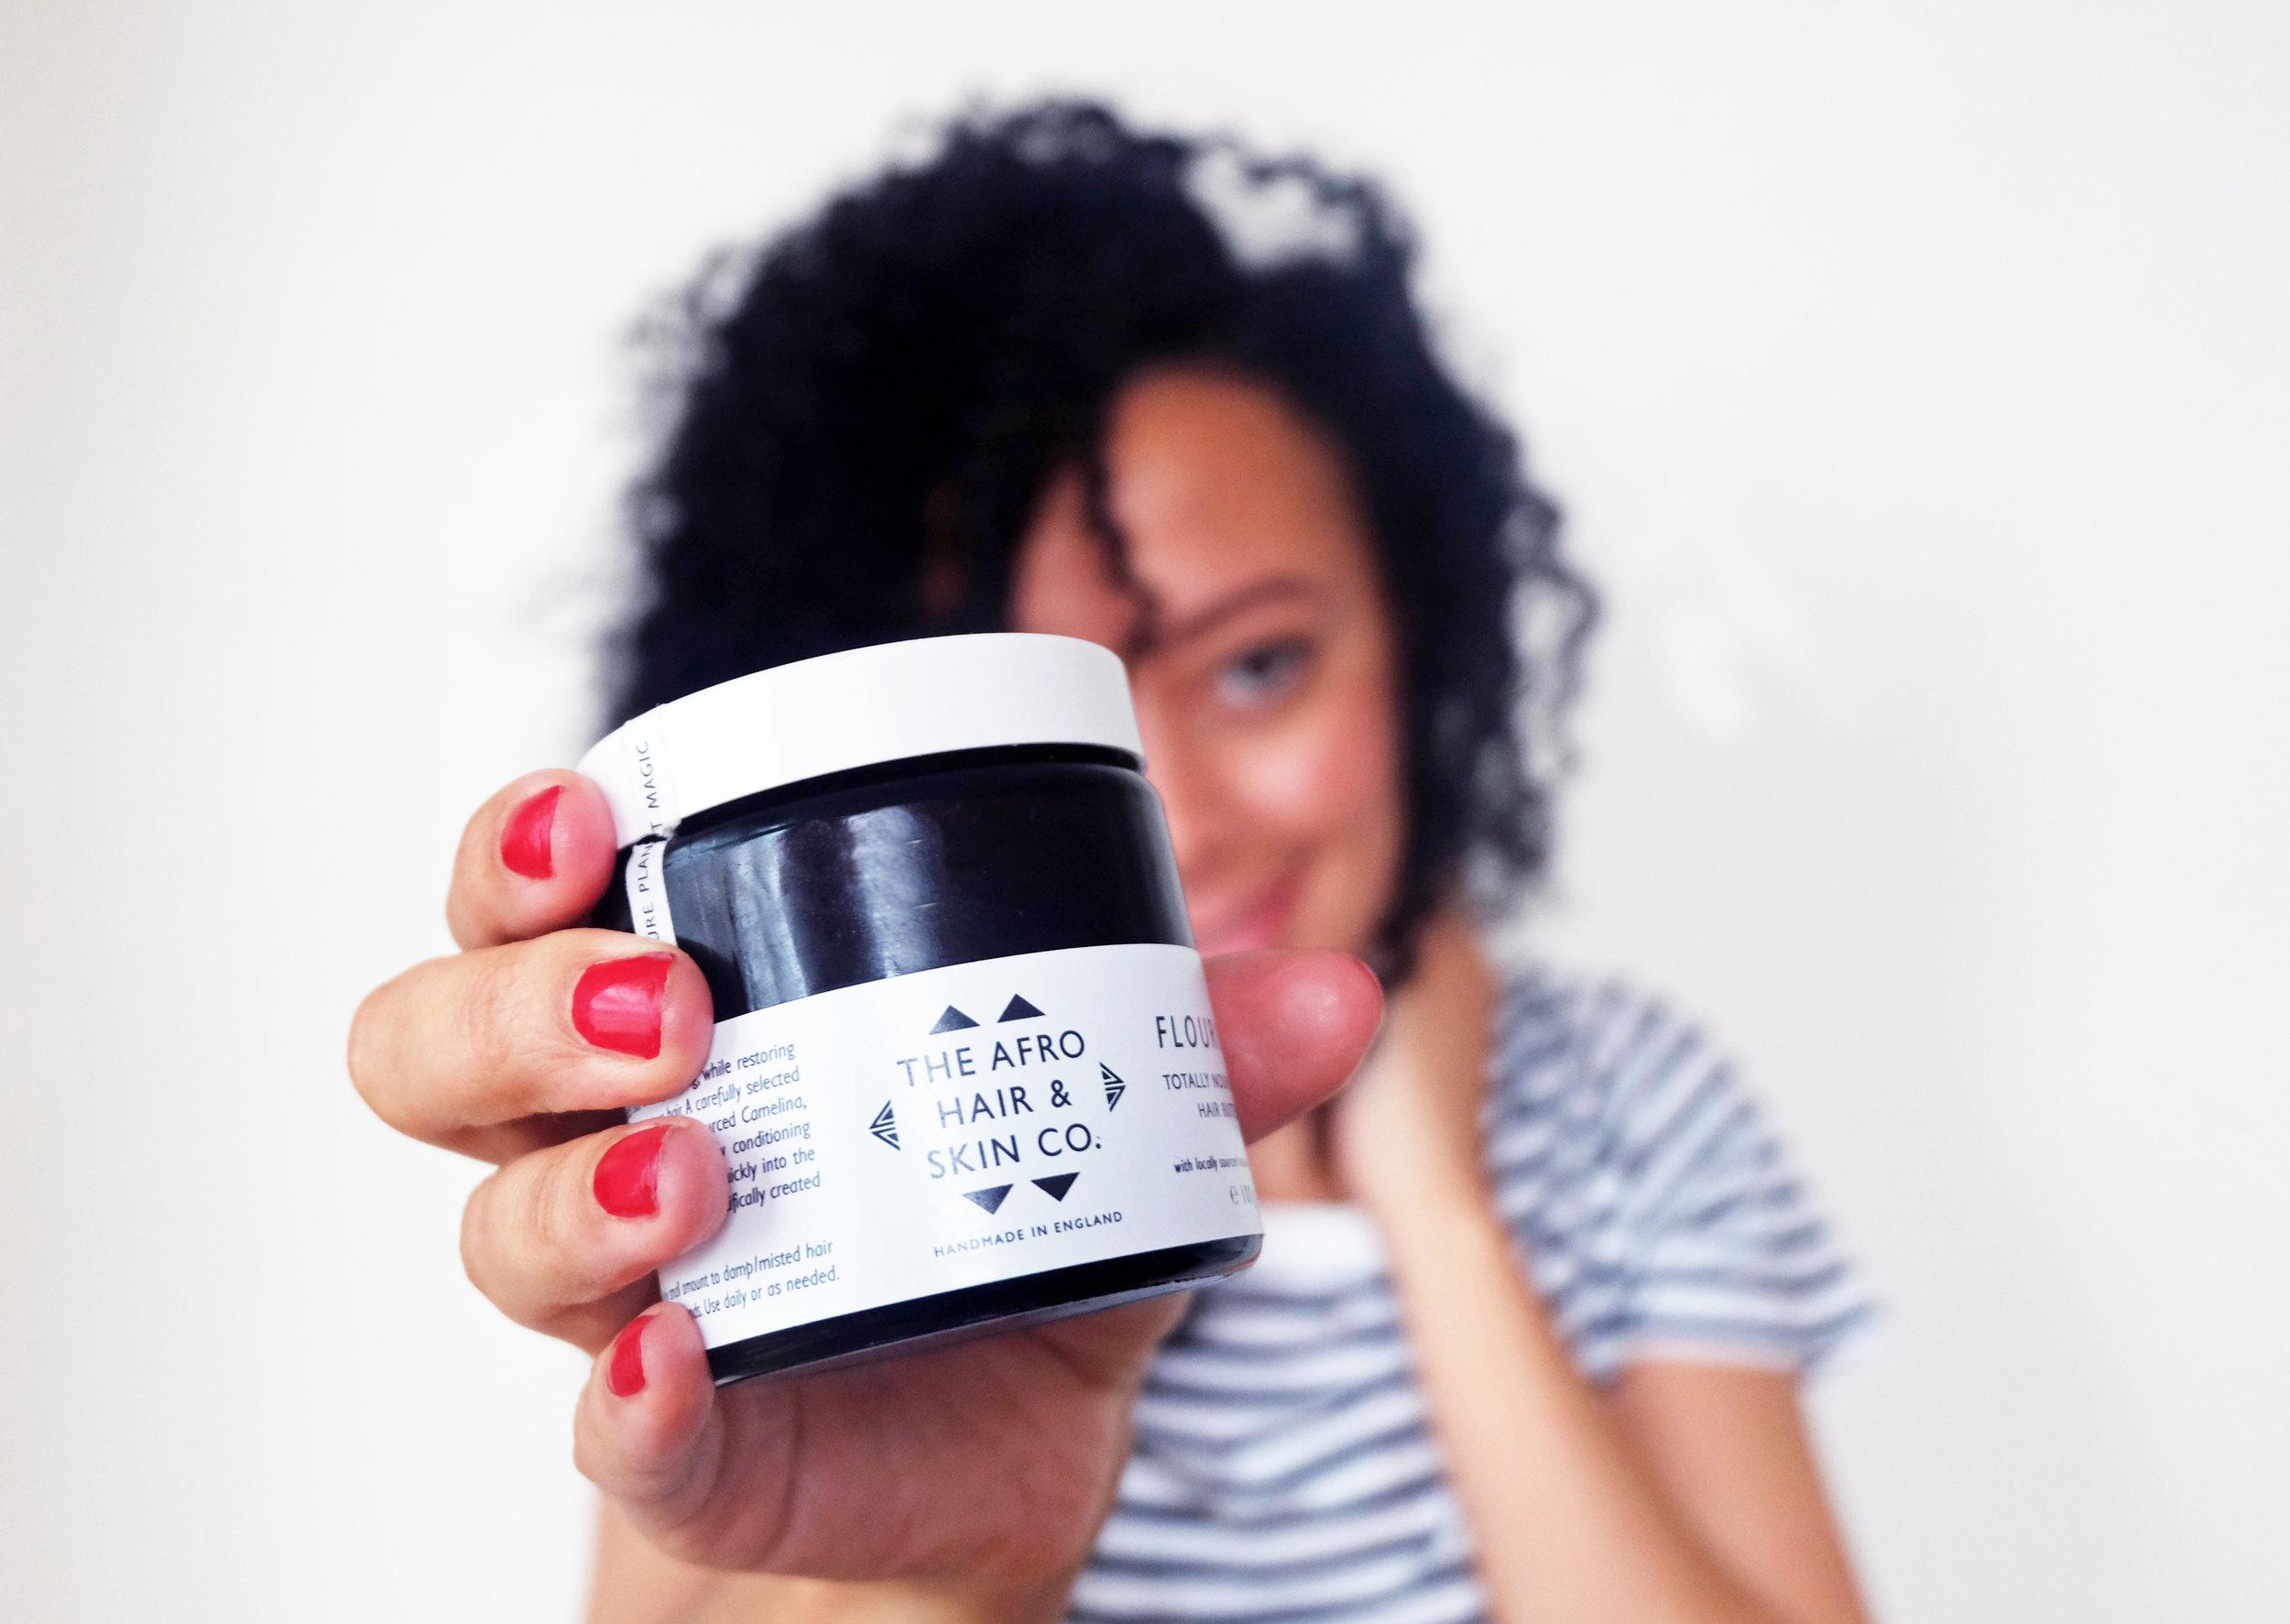 The Afro Hair & Skin Company - Flourish hair butter